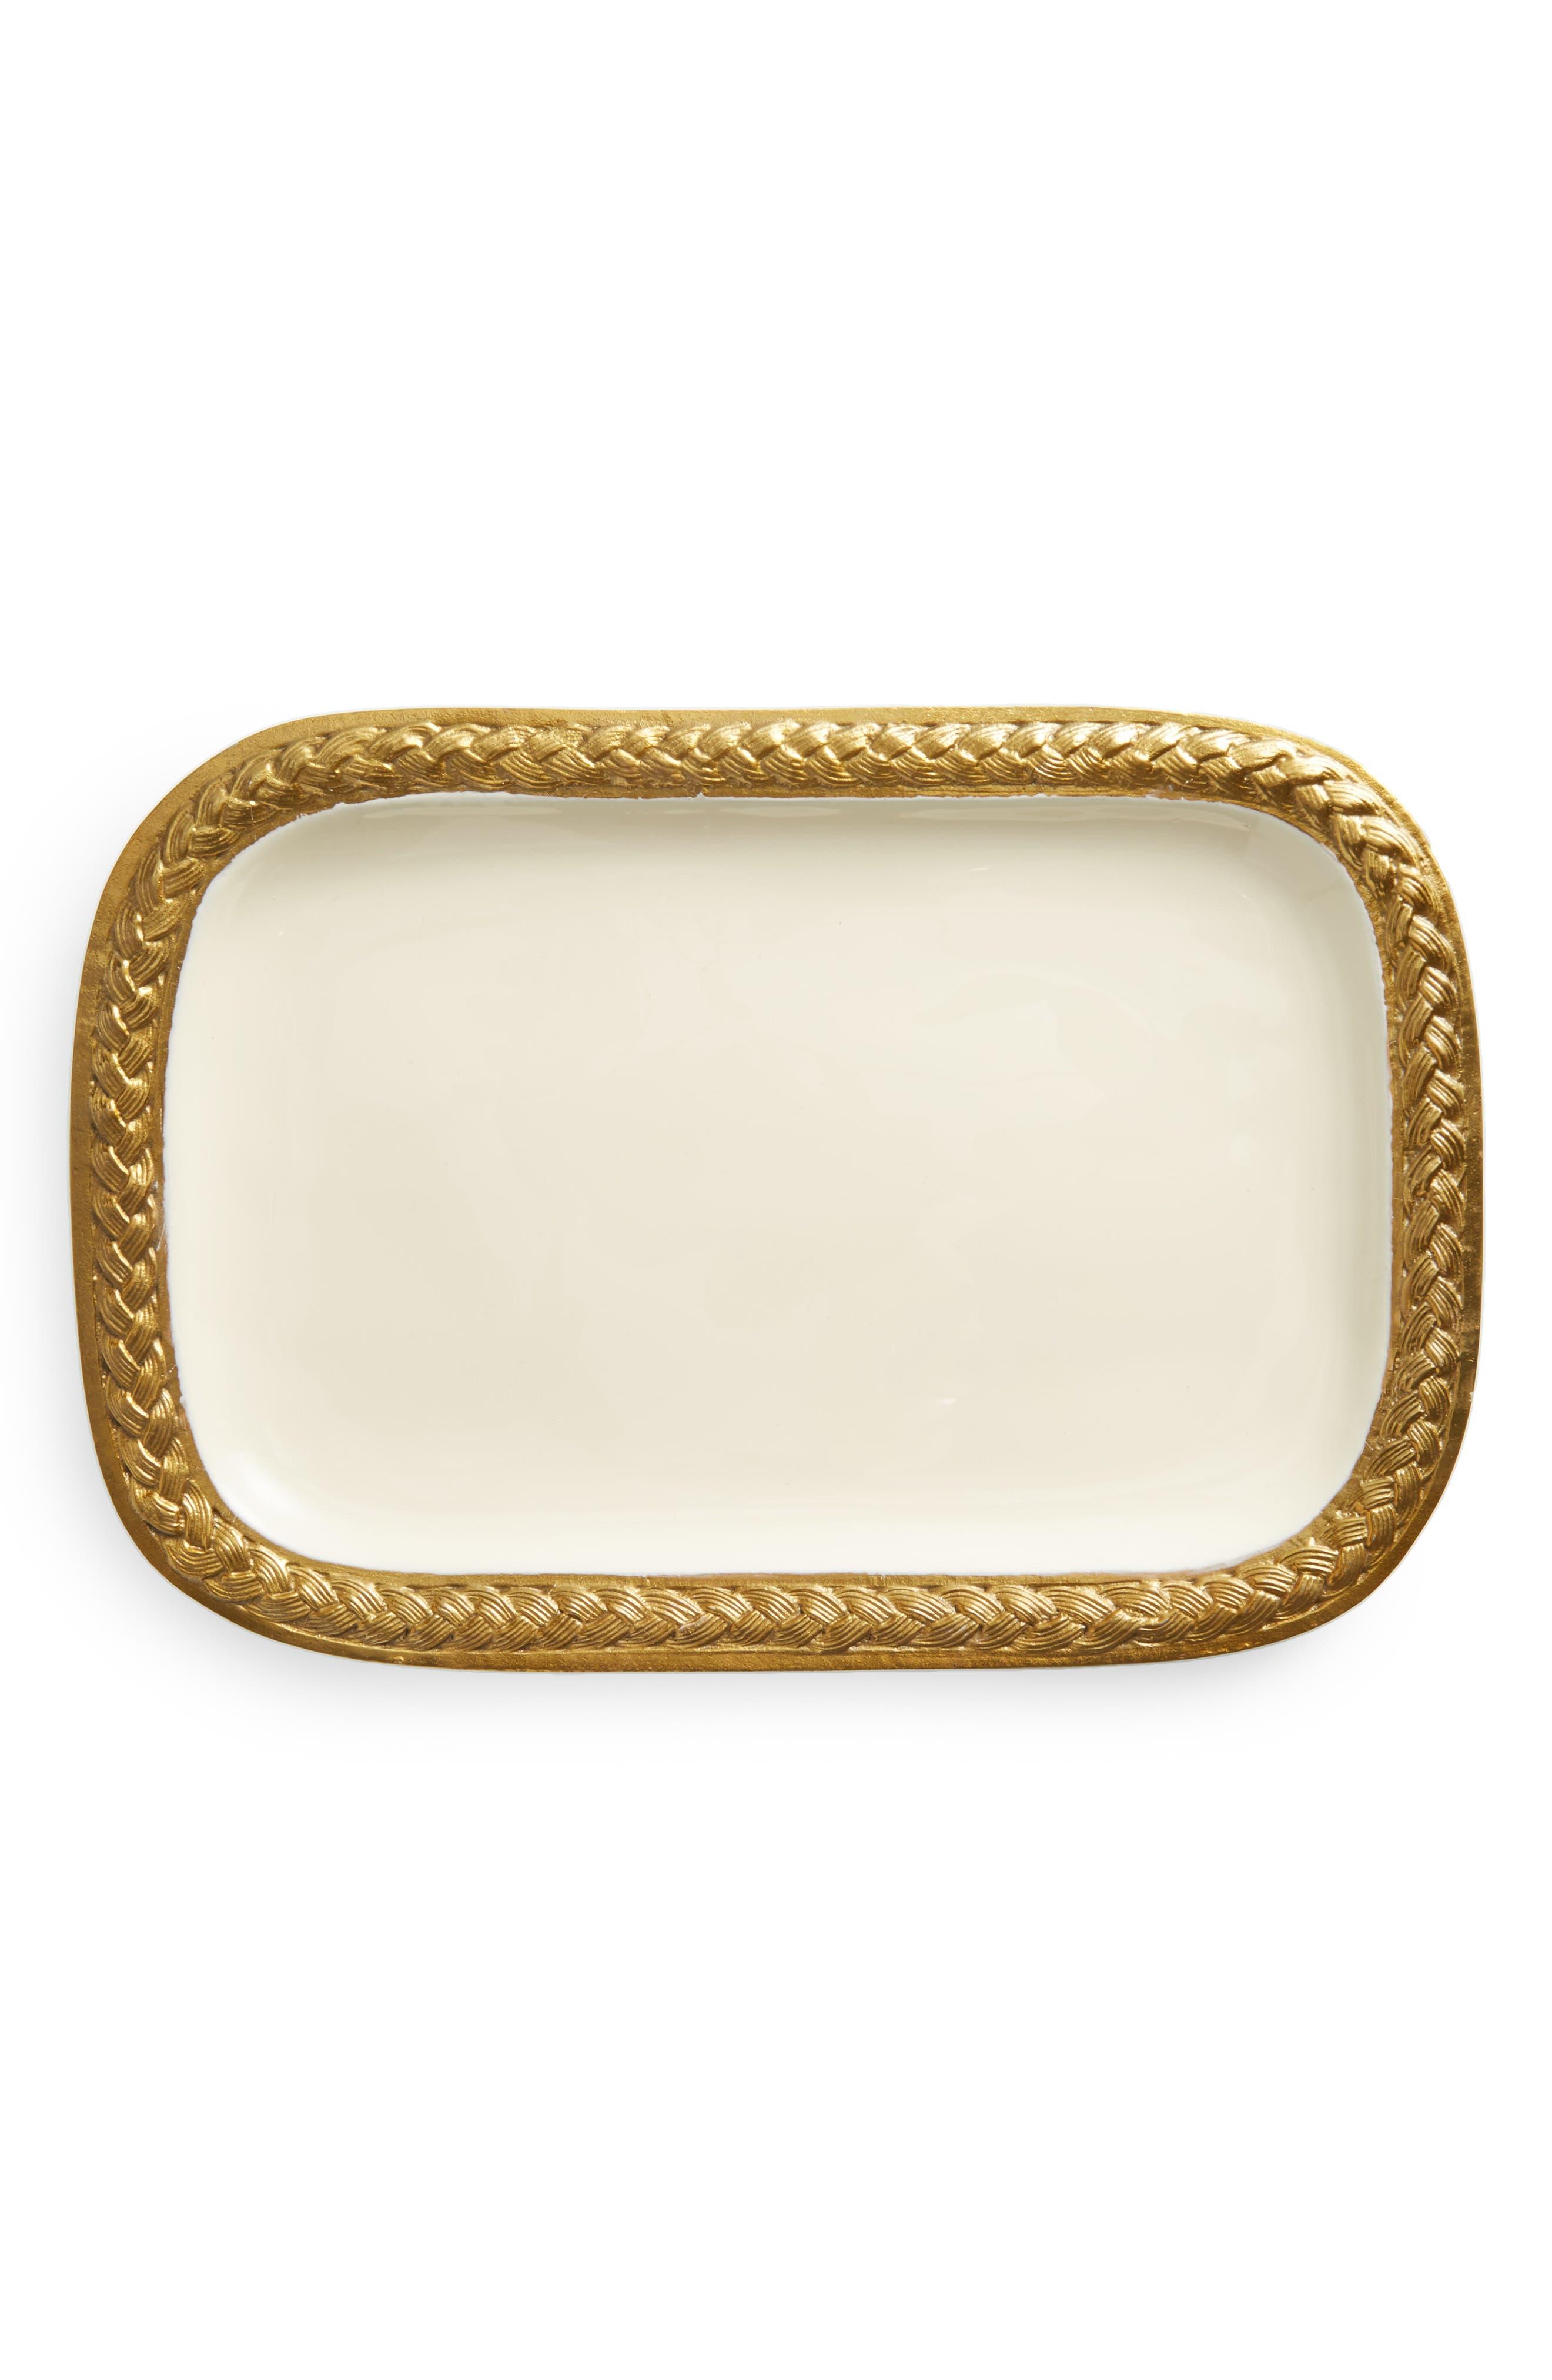 Main Image - Marigold Artisans Braid Platter